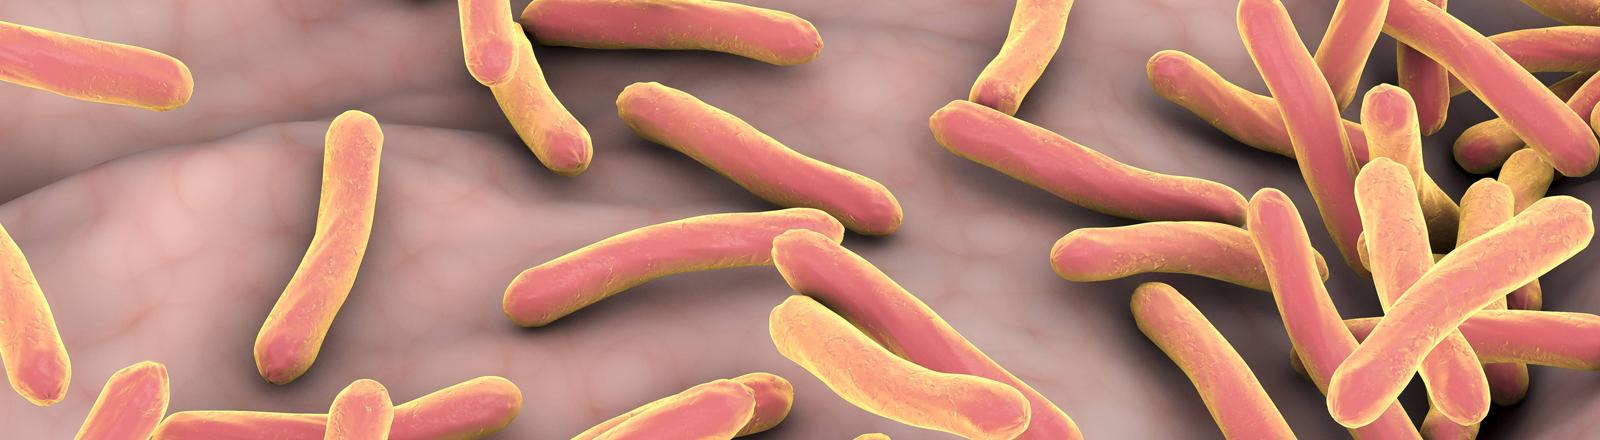 Tuberkulosebakterien